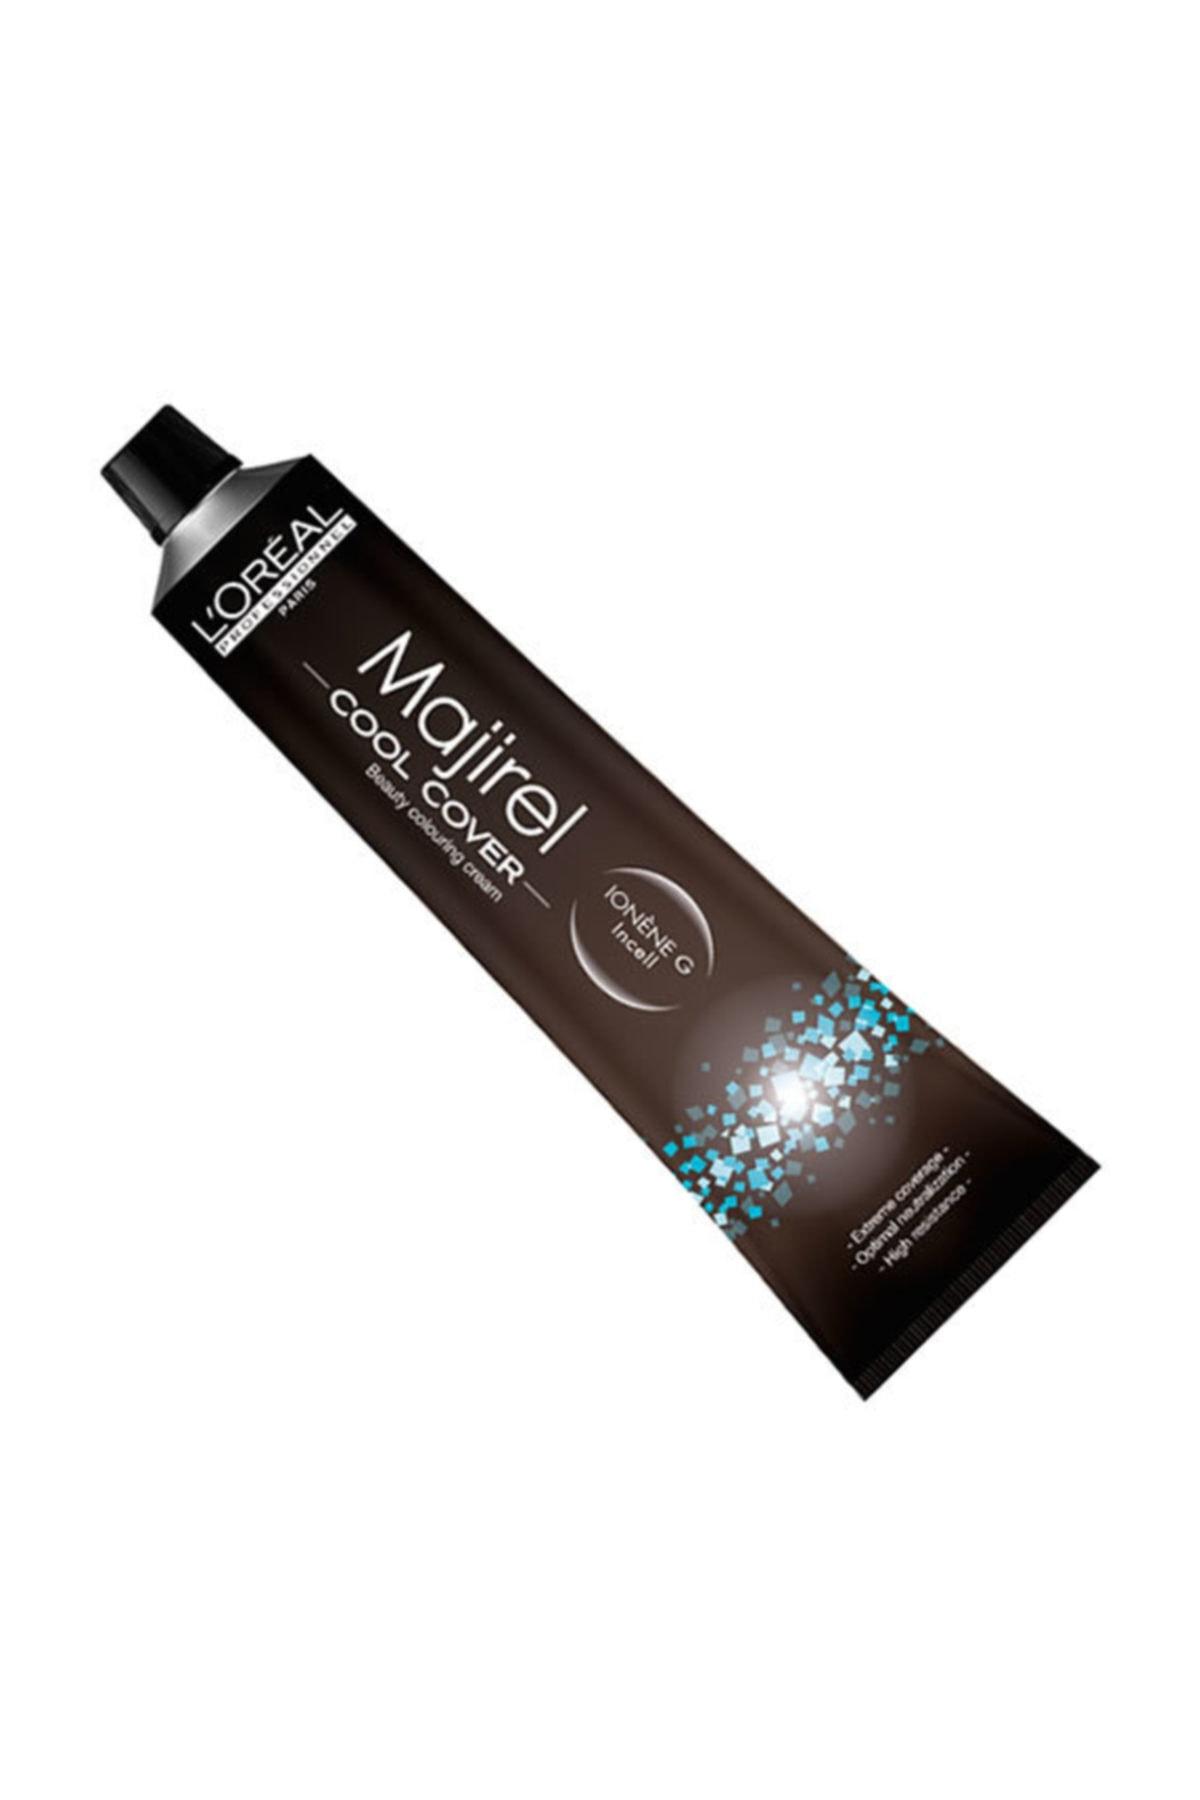 L'oreal Professionnel L'oreal Majirel Cool Cover 9.1 Çok Açık Kumral Saç Boyası 50ml 1